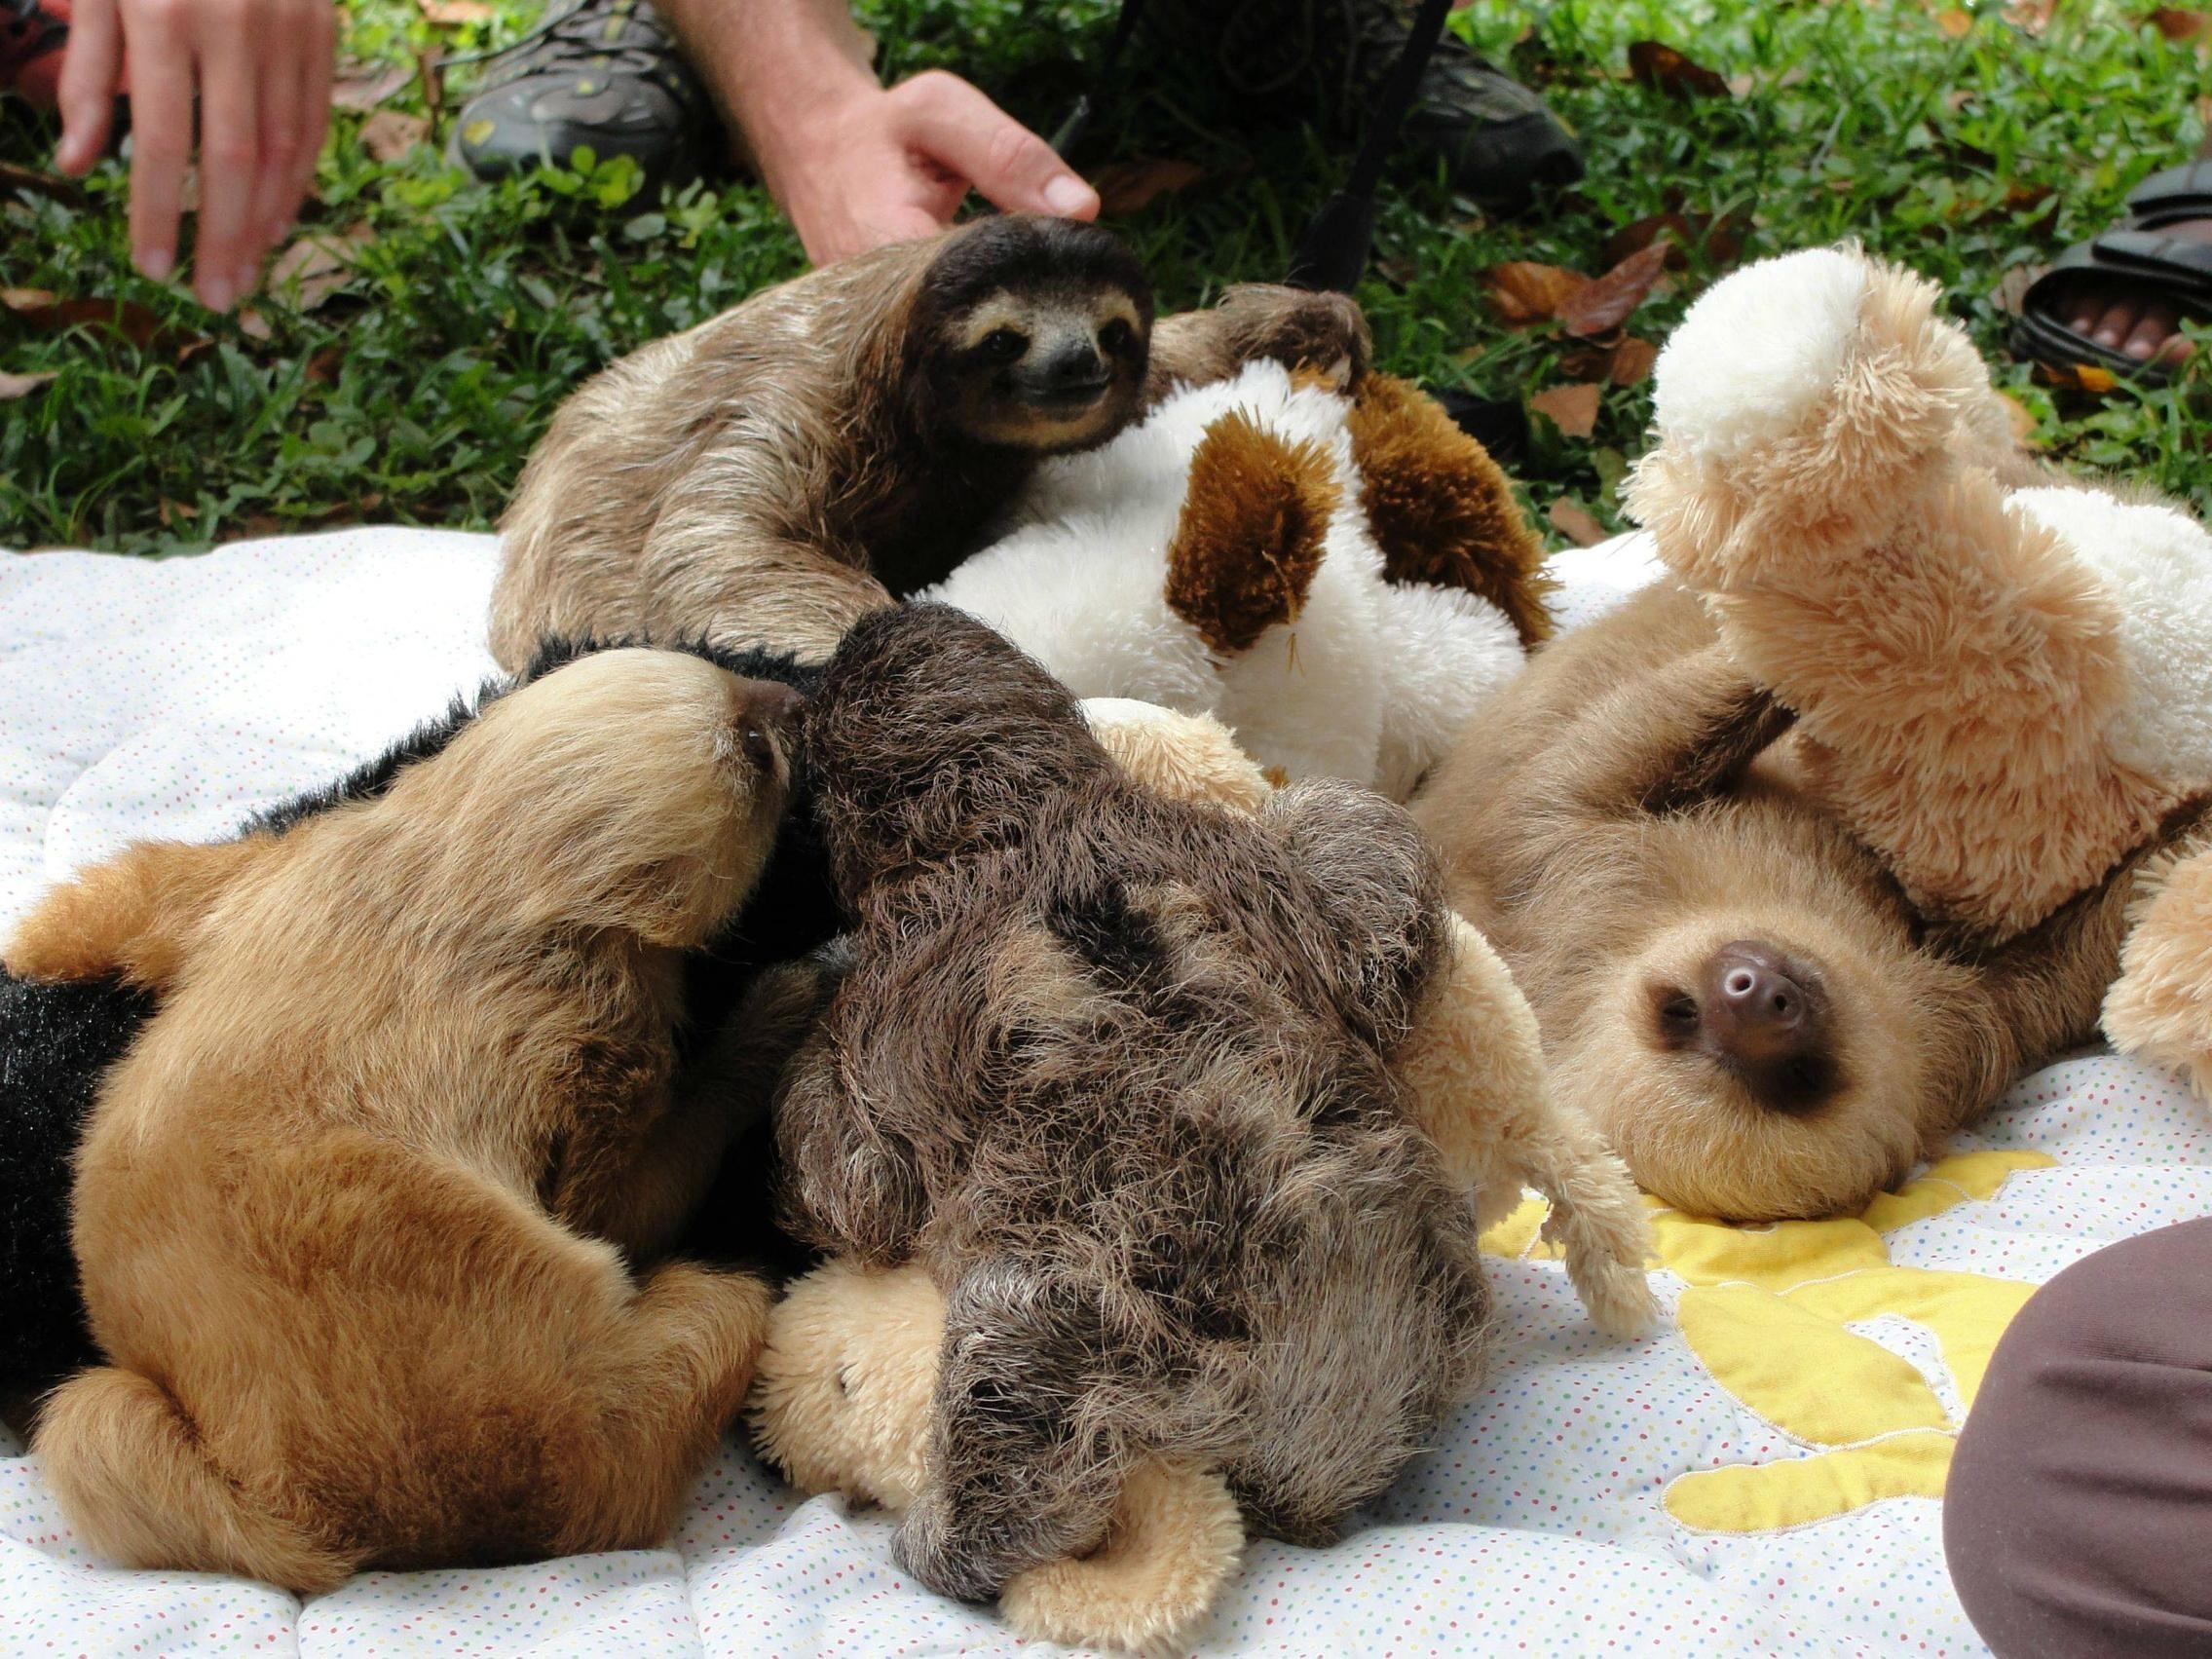 Sloth+Meme | Free Sloth Meme #764 HD Wallpaper | High Definition Wallpapers  For